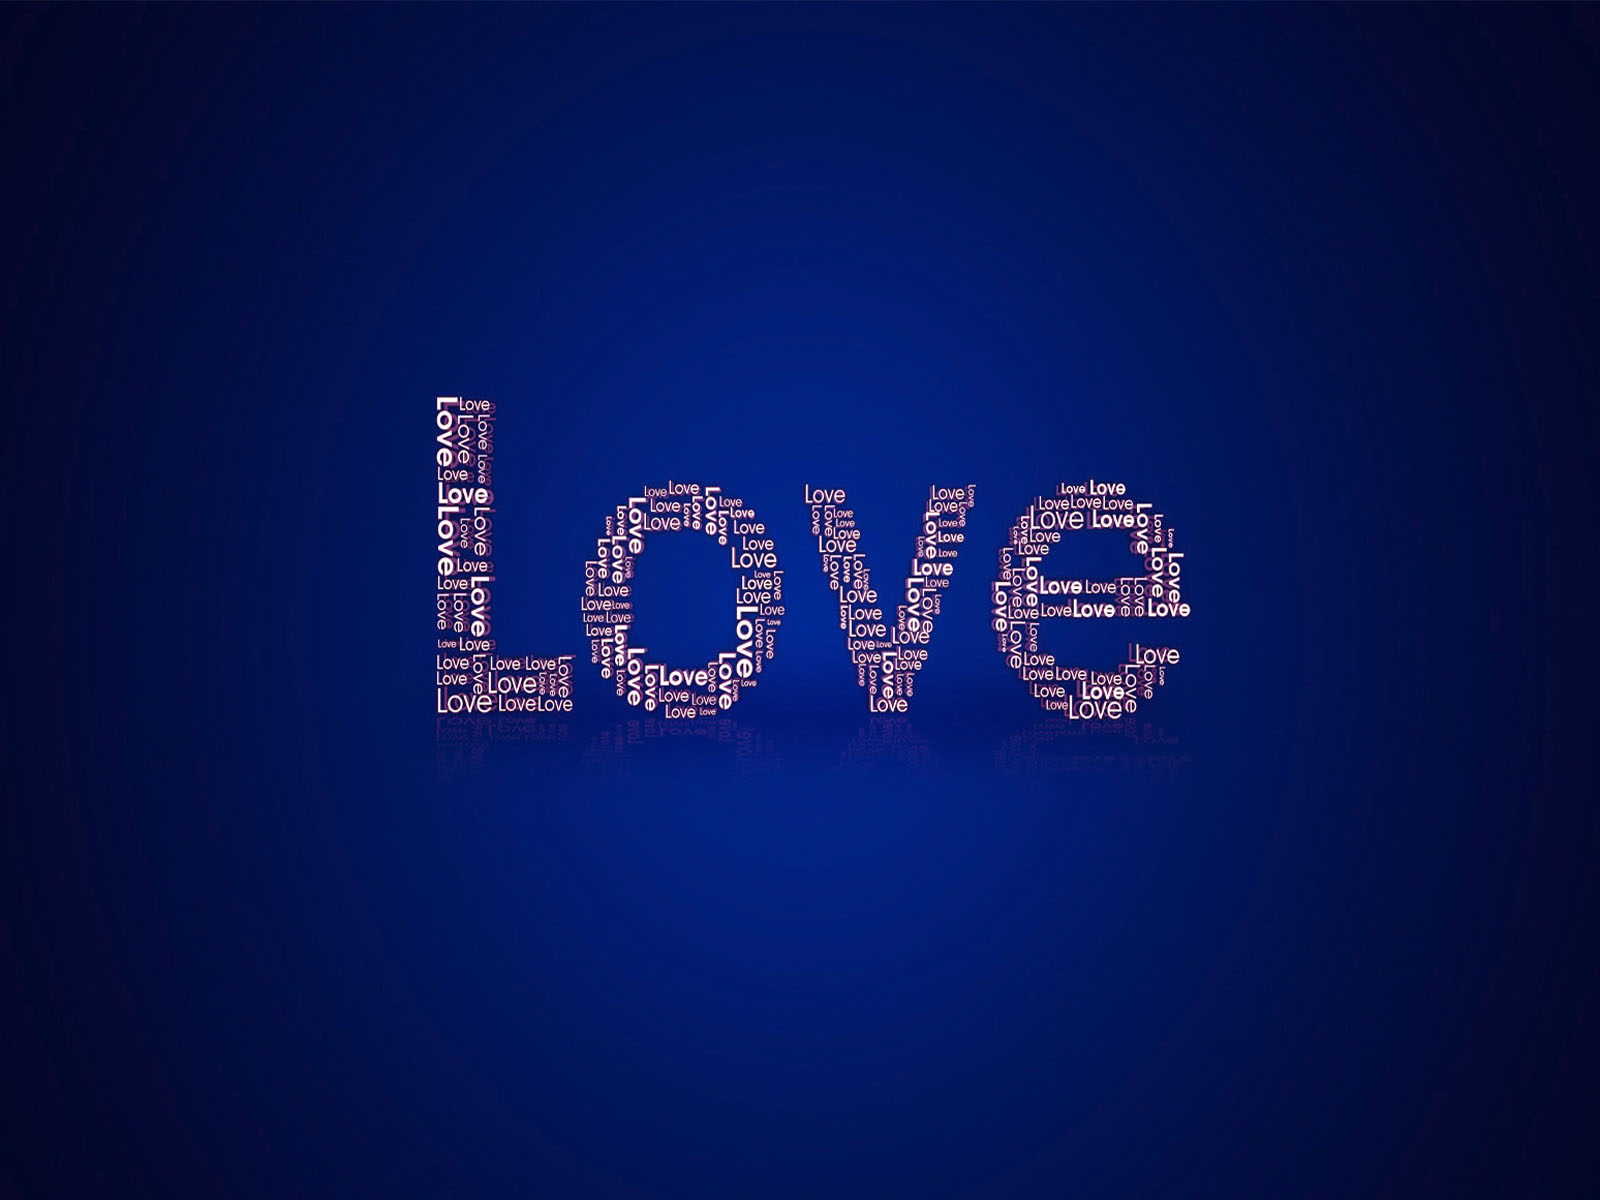 wallpapers: Love Words Wallpapers